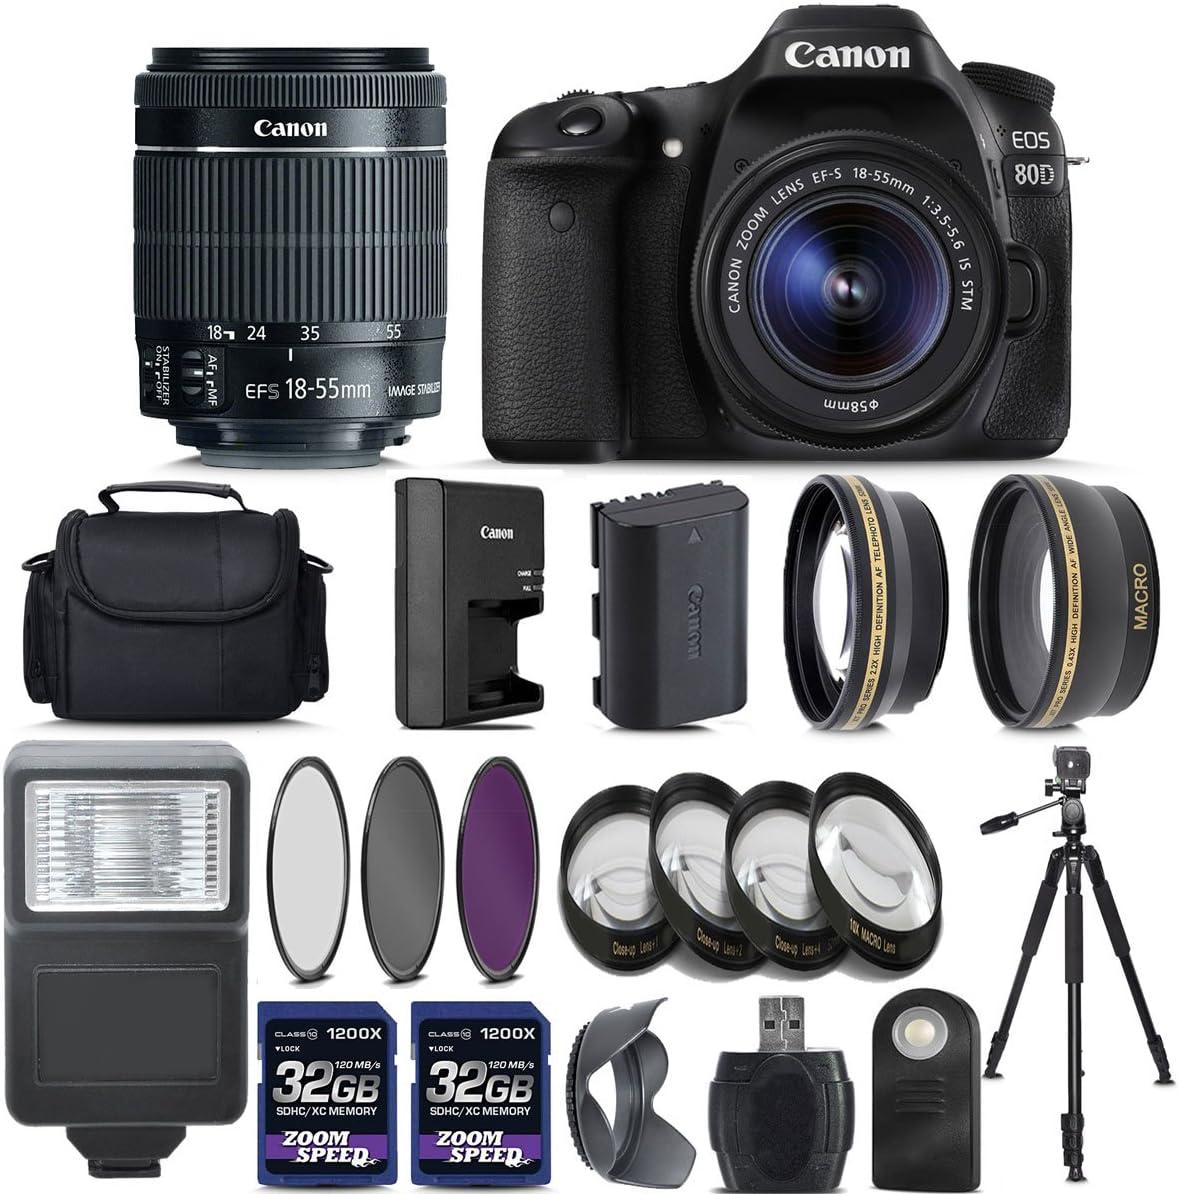 Canon EOS 80D Digital SLR Camera + 18-55mm is STM Lens + 2 X 32GB + Telephoto + Wide-Angle Lens + 4PC Macro Kit + 3PC Filter Kit + Flash + Case + Tripod - International Version